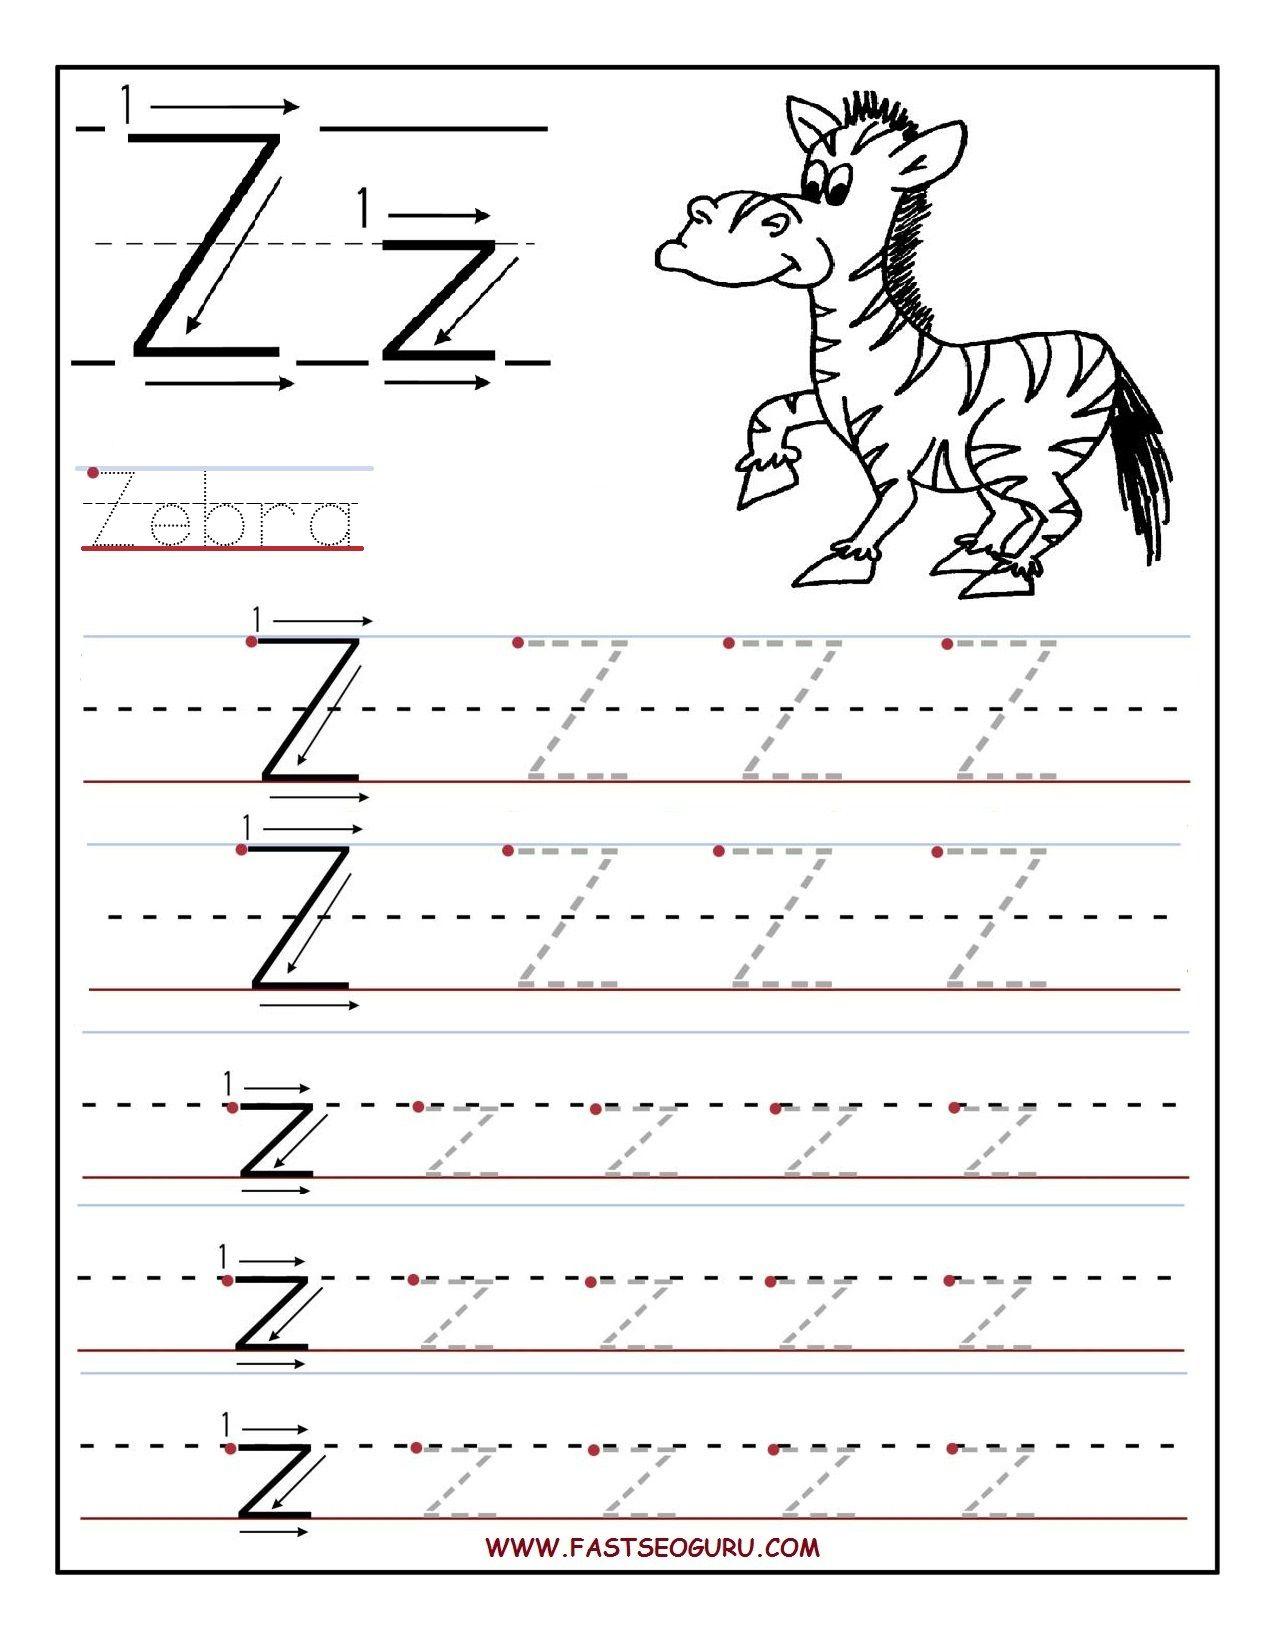 Pinvilfran Gason On Decor | Letter Tracing Worksheets in Tracing Letters A To Z Worksheets